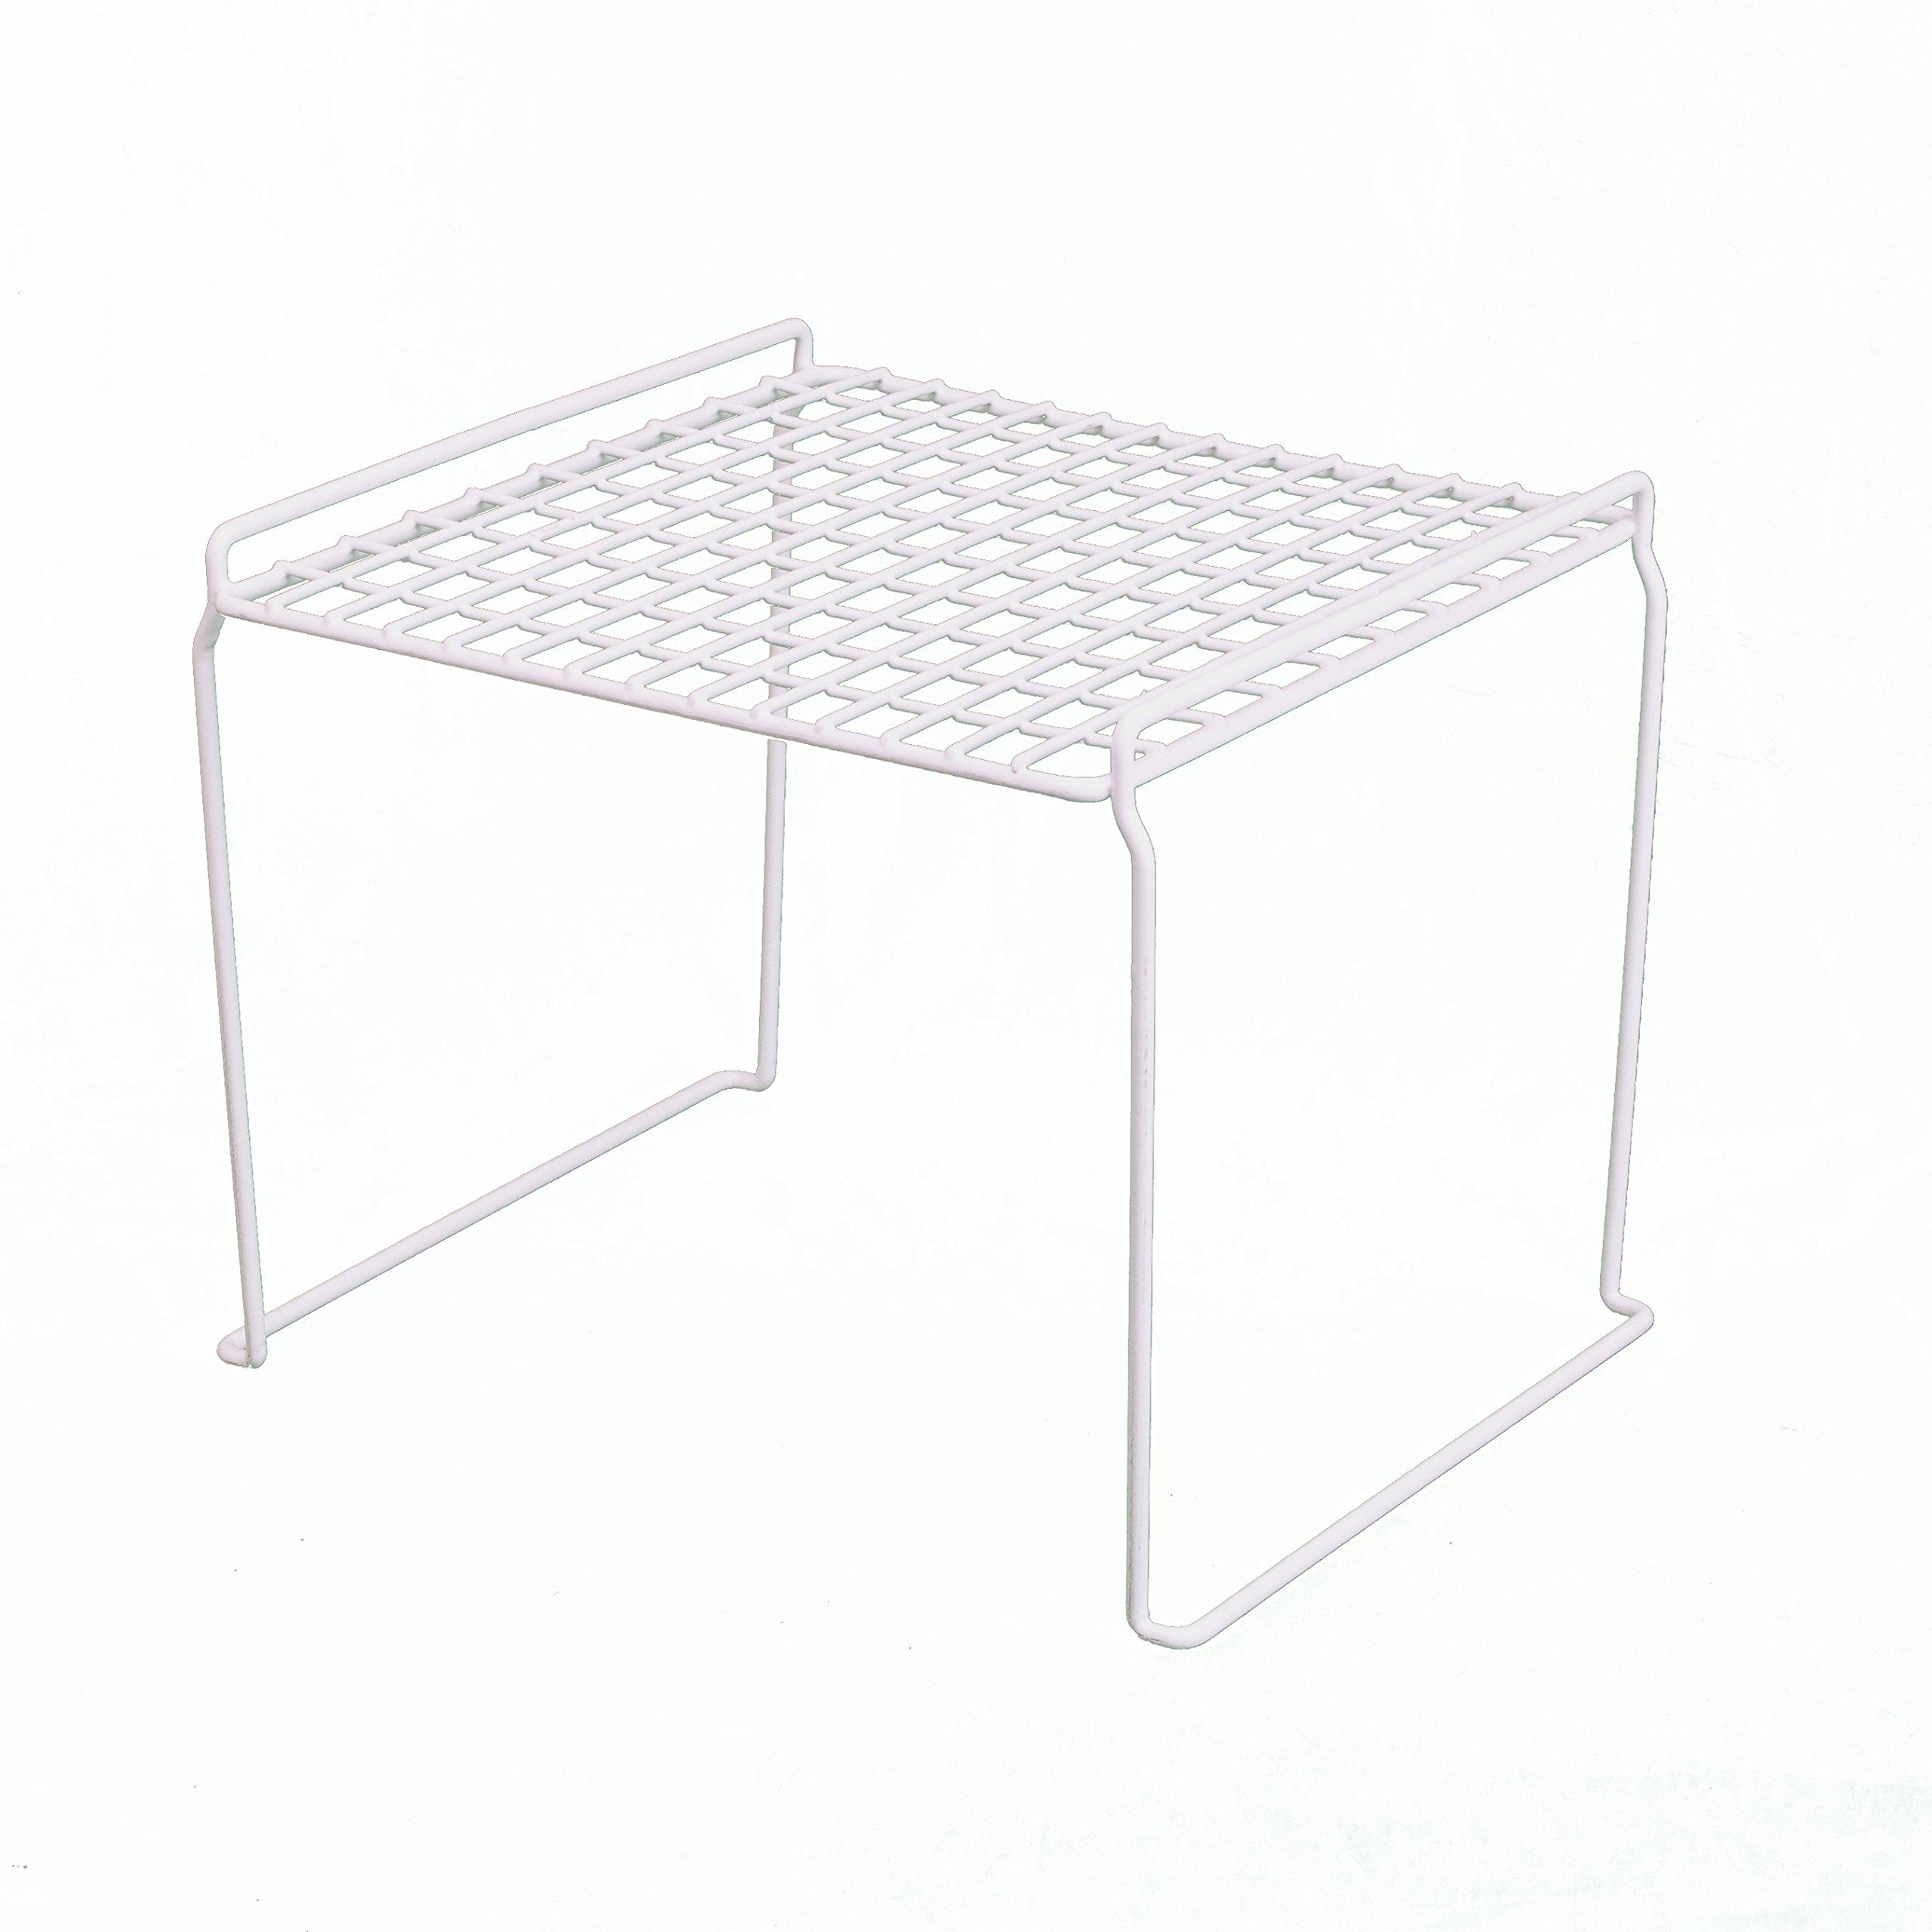 Grayline 44021, Square Heavy Duty Stacking Shelf, White